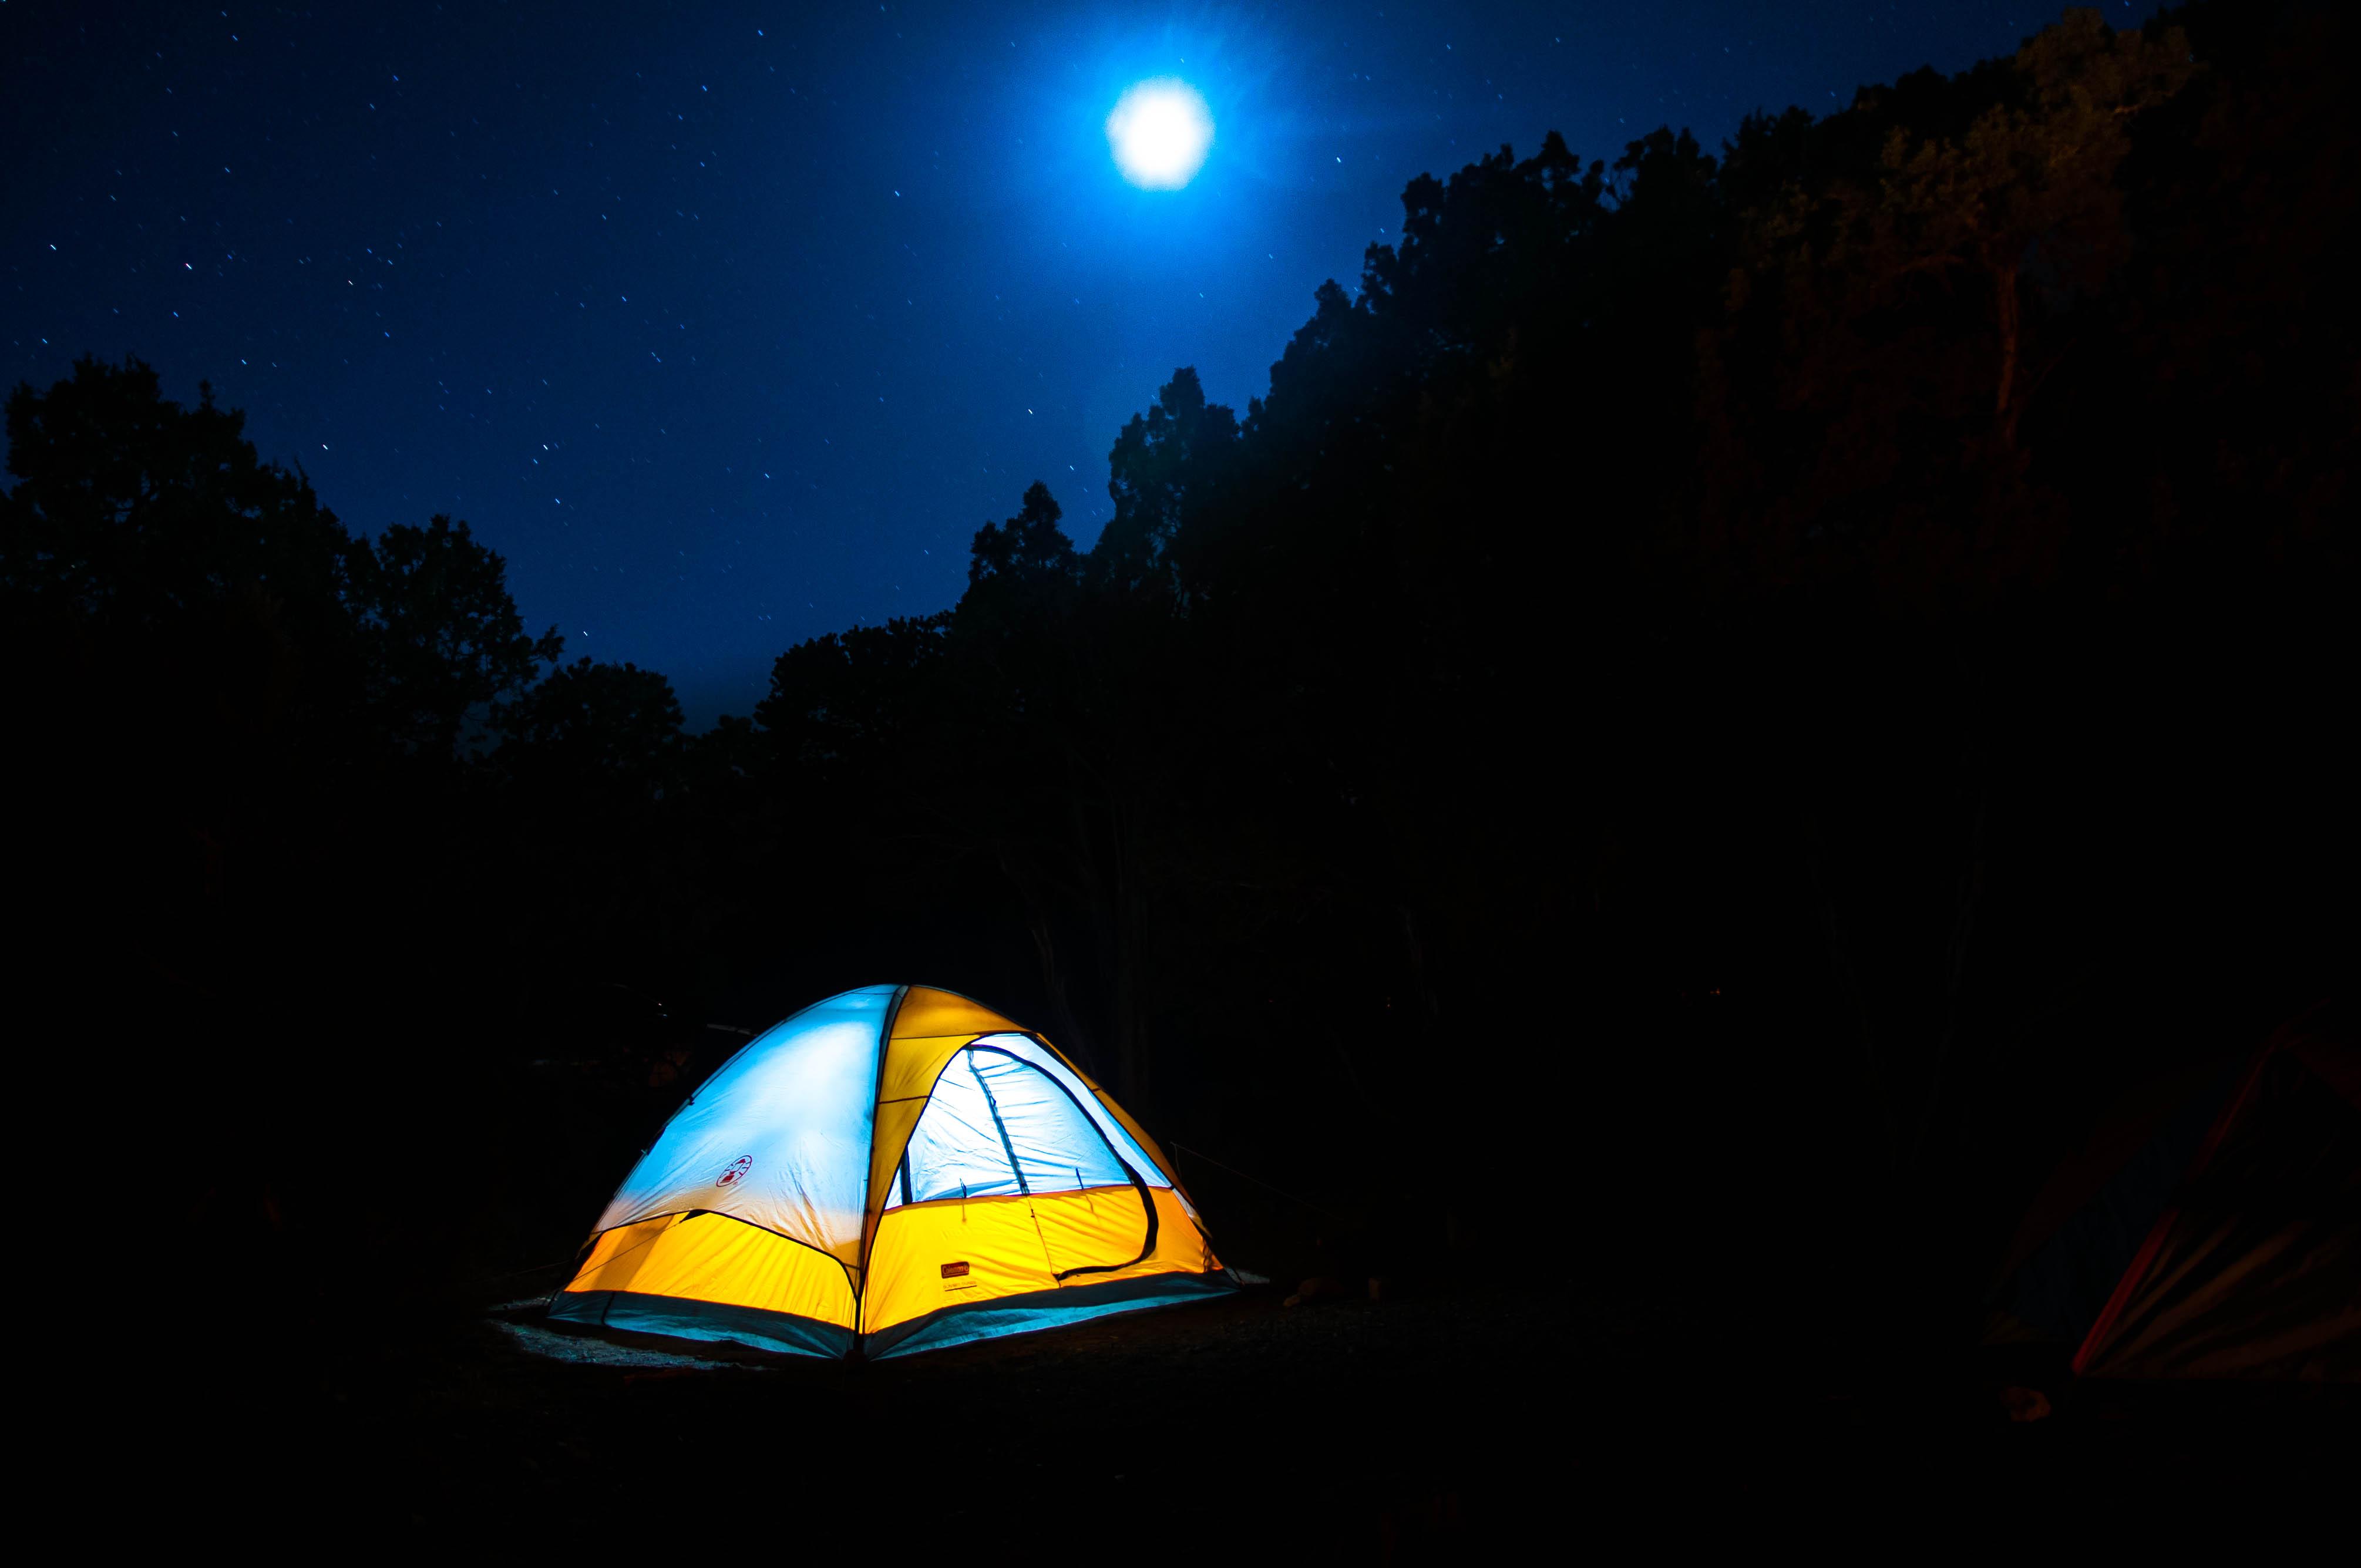 camping wallpaper 1 4020x2670